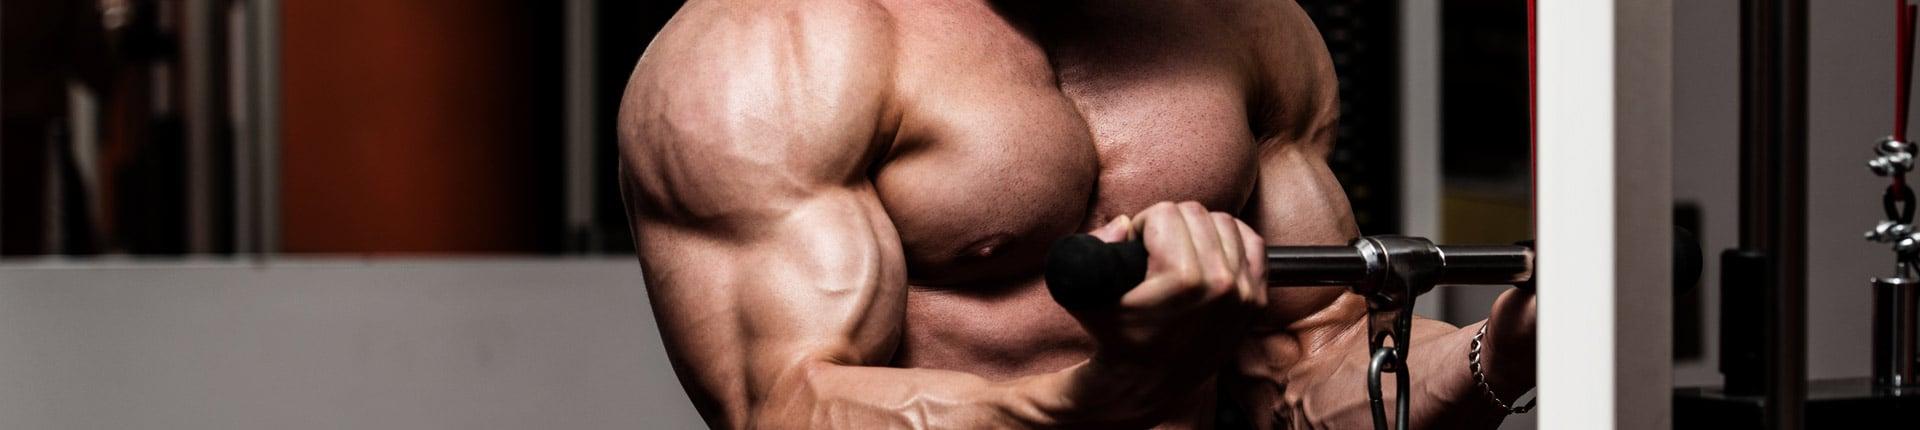 Warsztat: biceps i triceps HIPERTROFIA ramion!